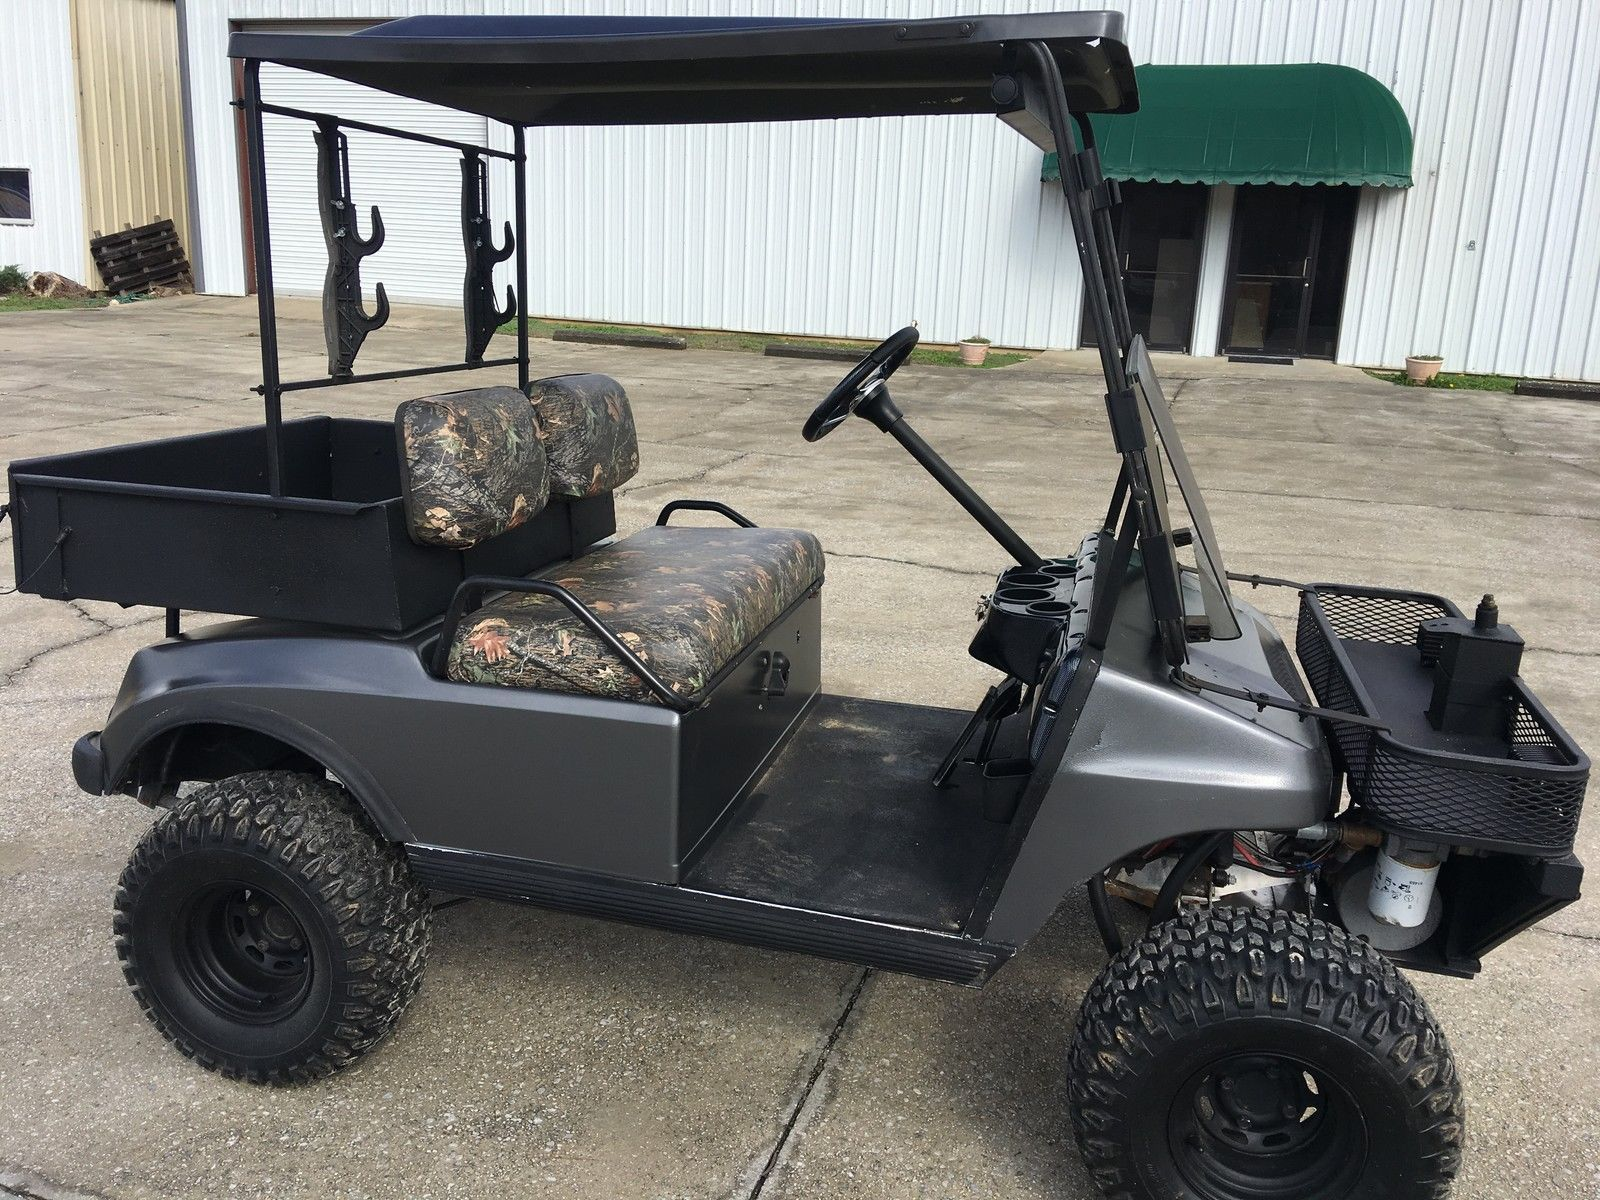 The exciting brand new street legal cruser sport elec car amp golf cart - Club Car Ds Golf Cart 4x4 Custom Hunting Buggy Ebay